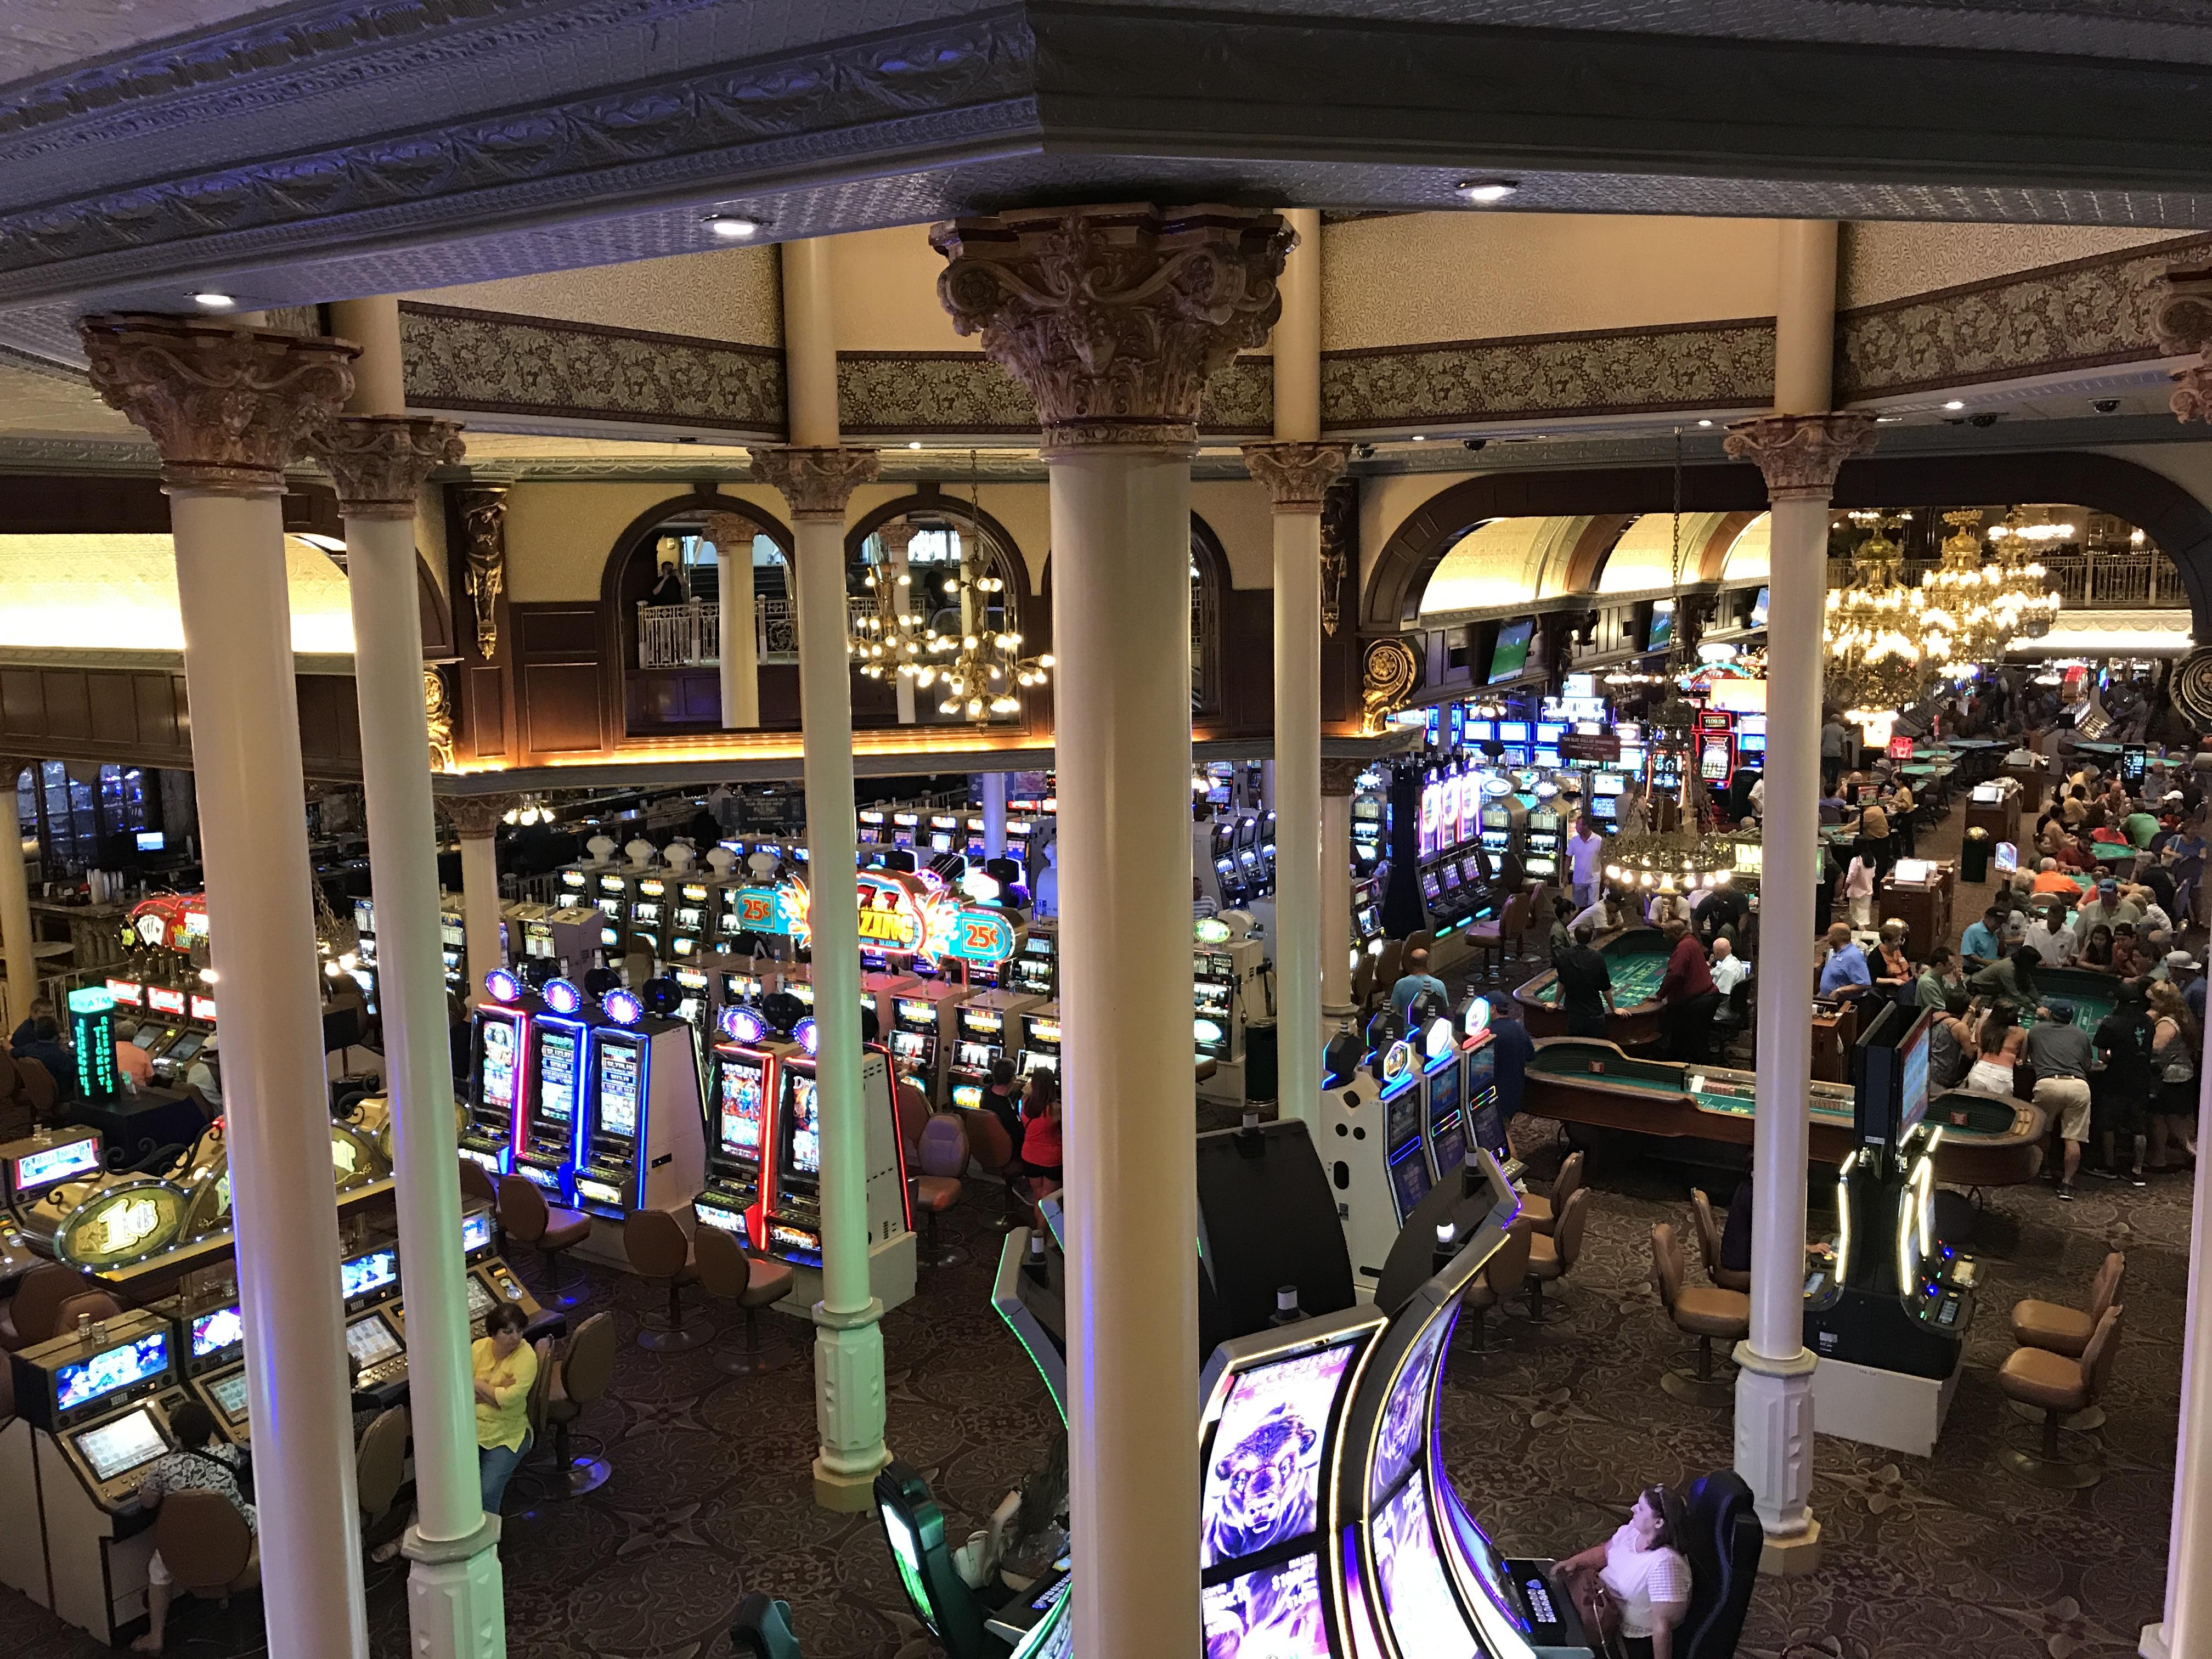 Remarkable Reviewing Garden Court Buffet At Main Street Station Vegas Interior Design Ideas Gentotthenellocom